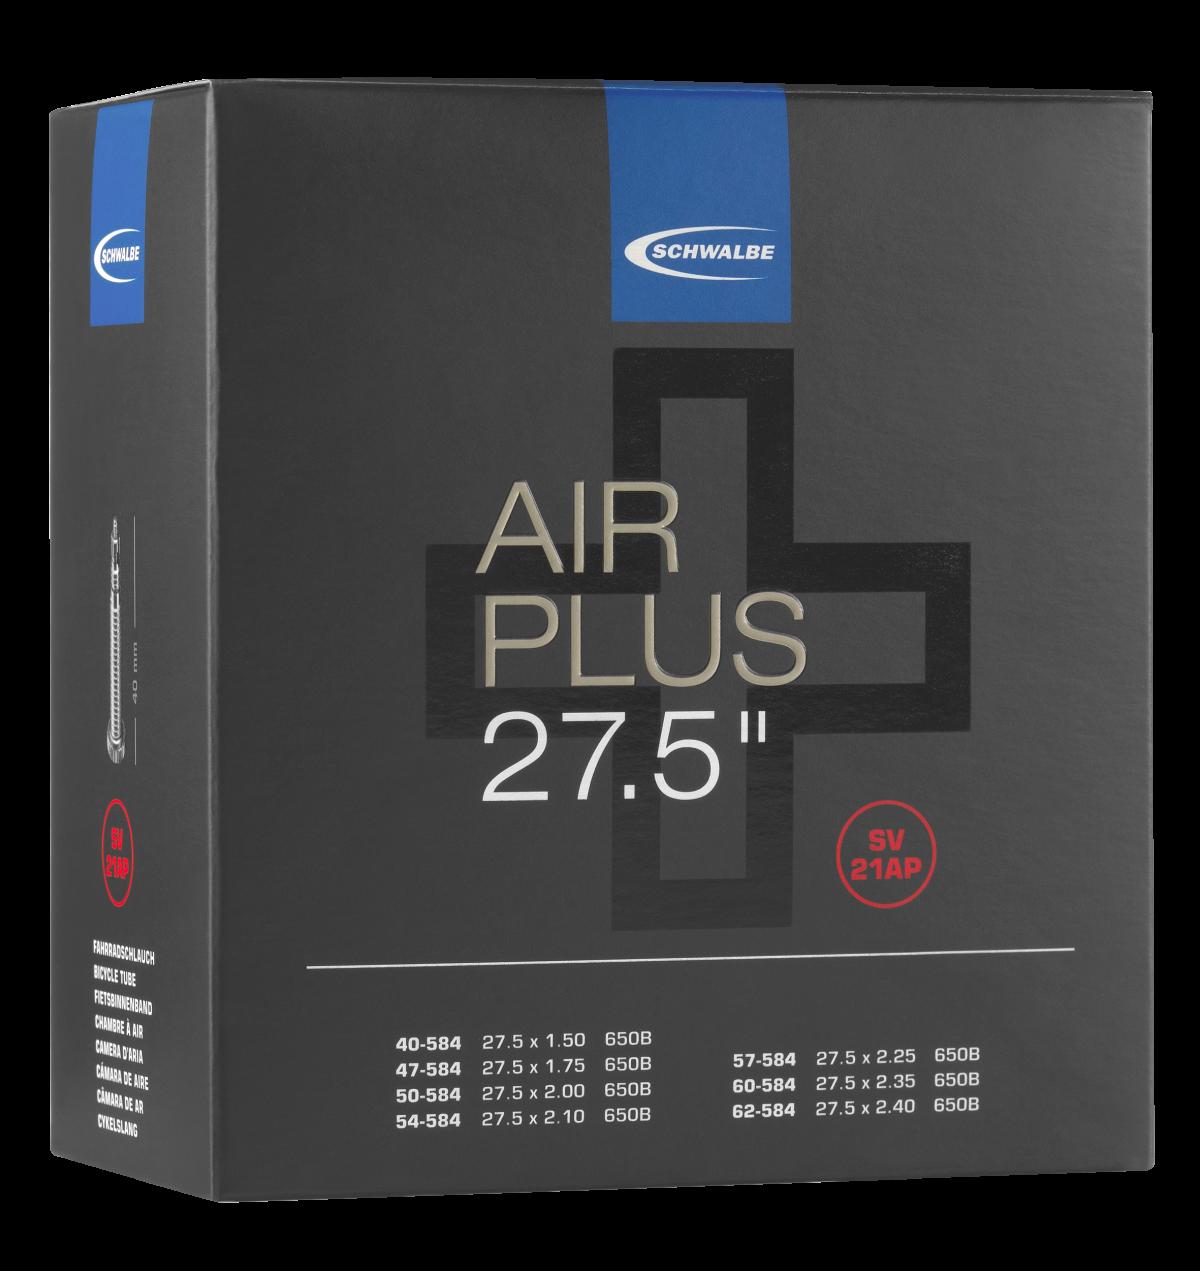 "Schwalbe Air Plus Schlauch 27.5"" No. 21AP (SV21AP, AV21AP)"